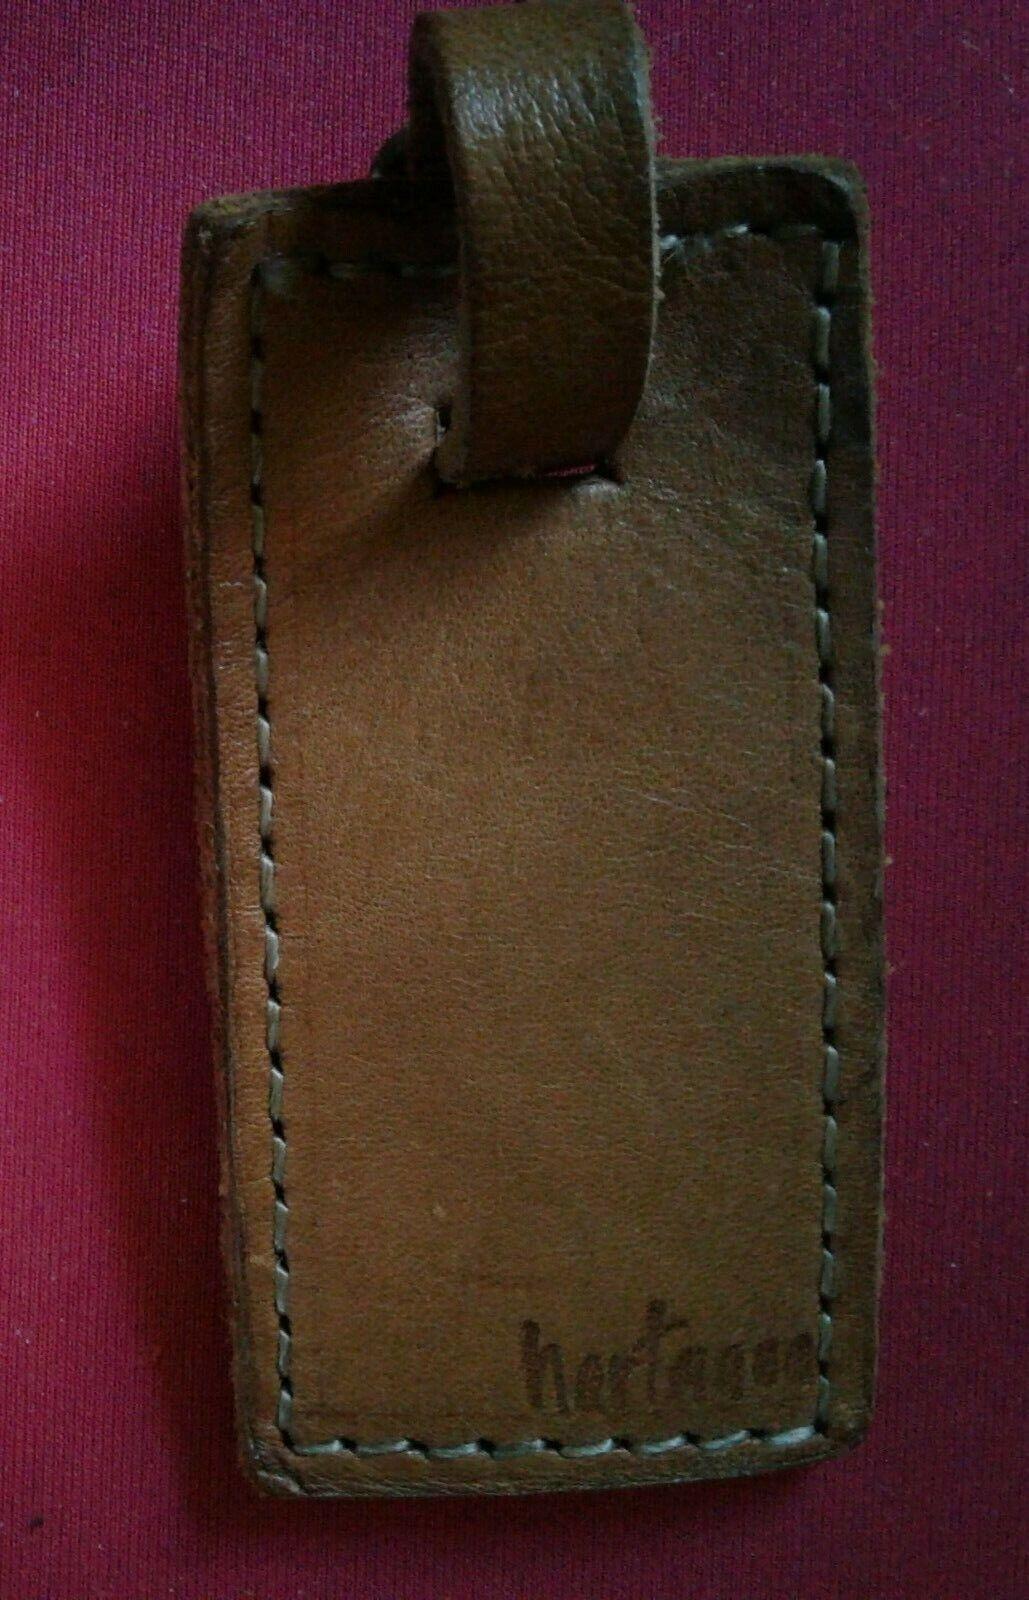 Vintage Hartmann Light Brown Tan Luggage Tag - $8.59